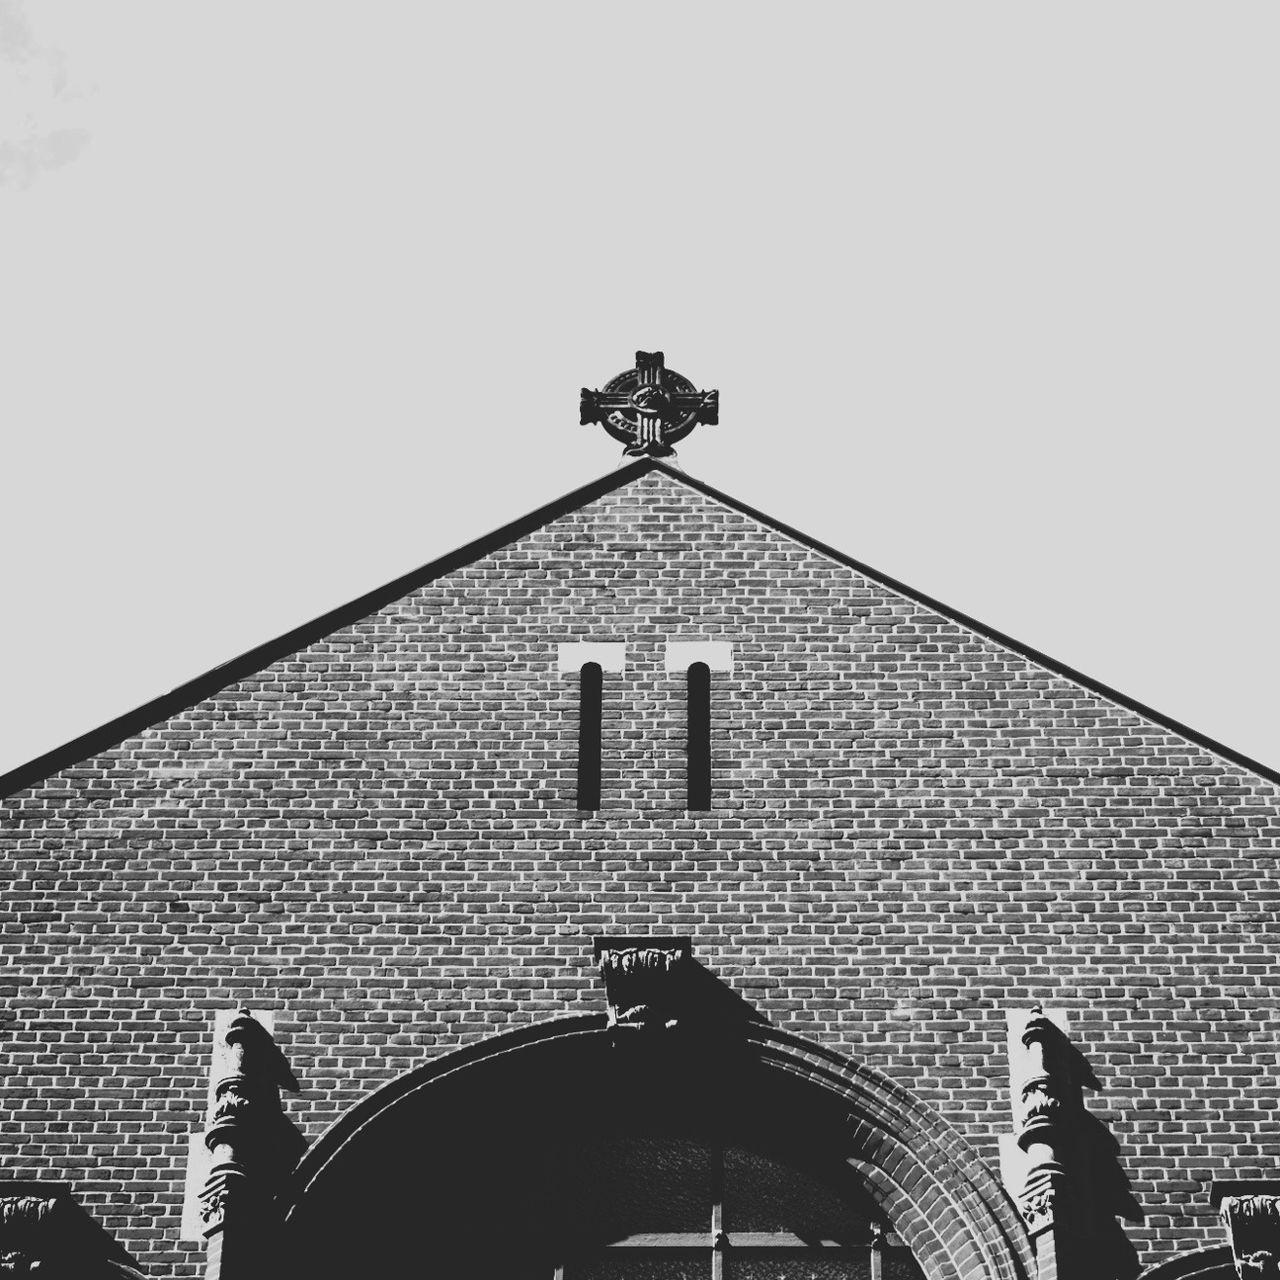 High section of church against clear sky